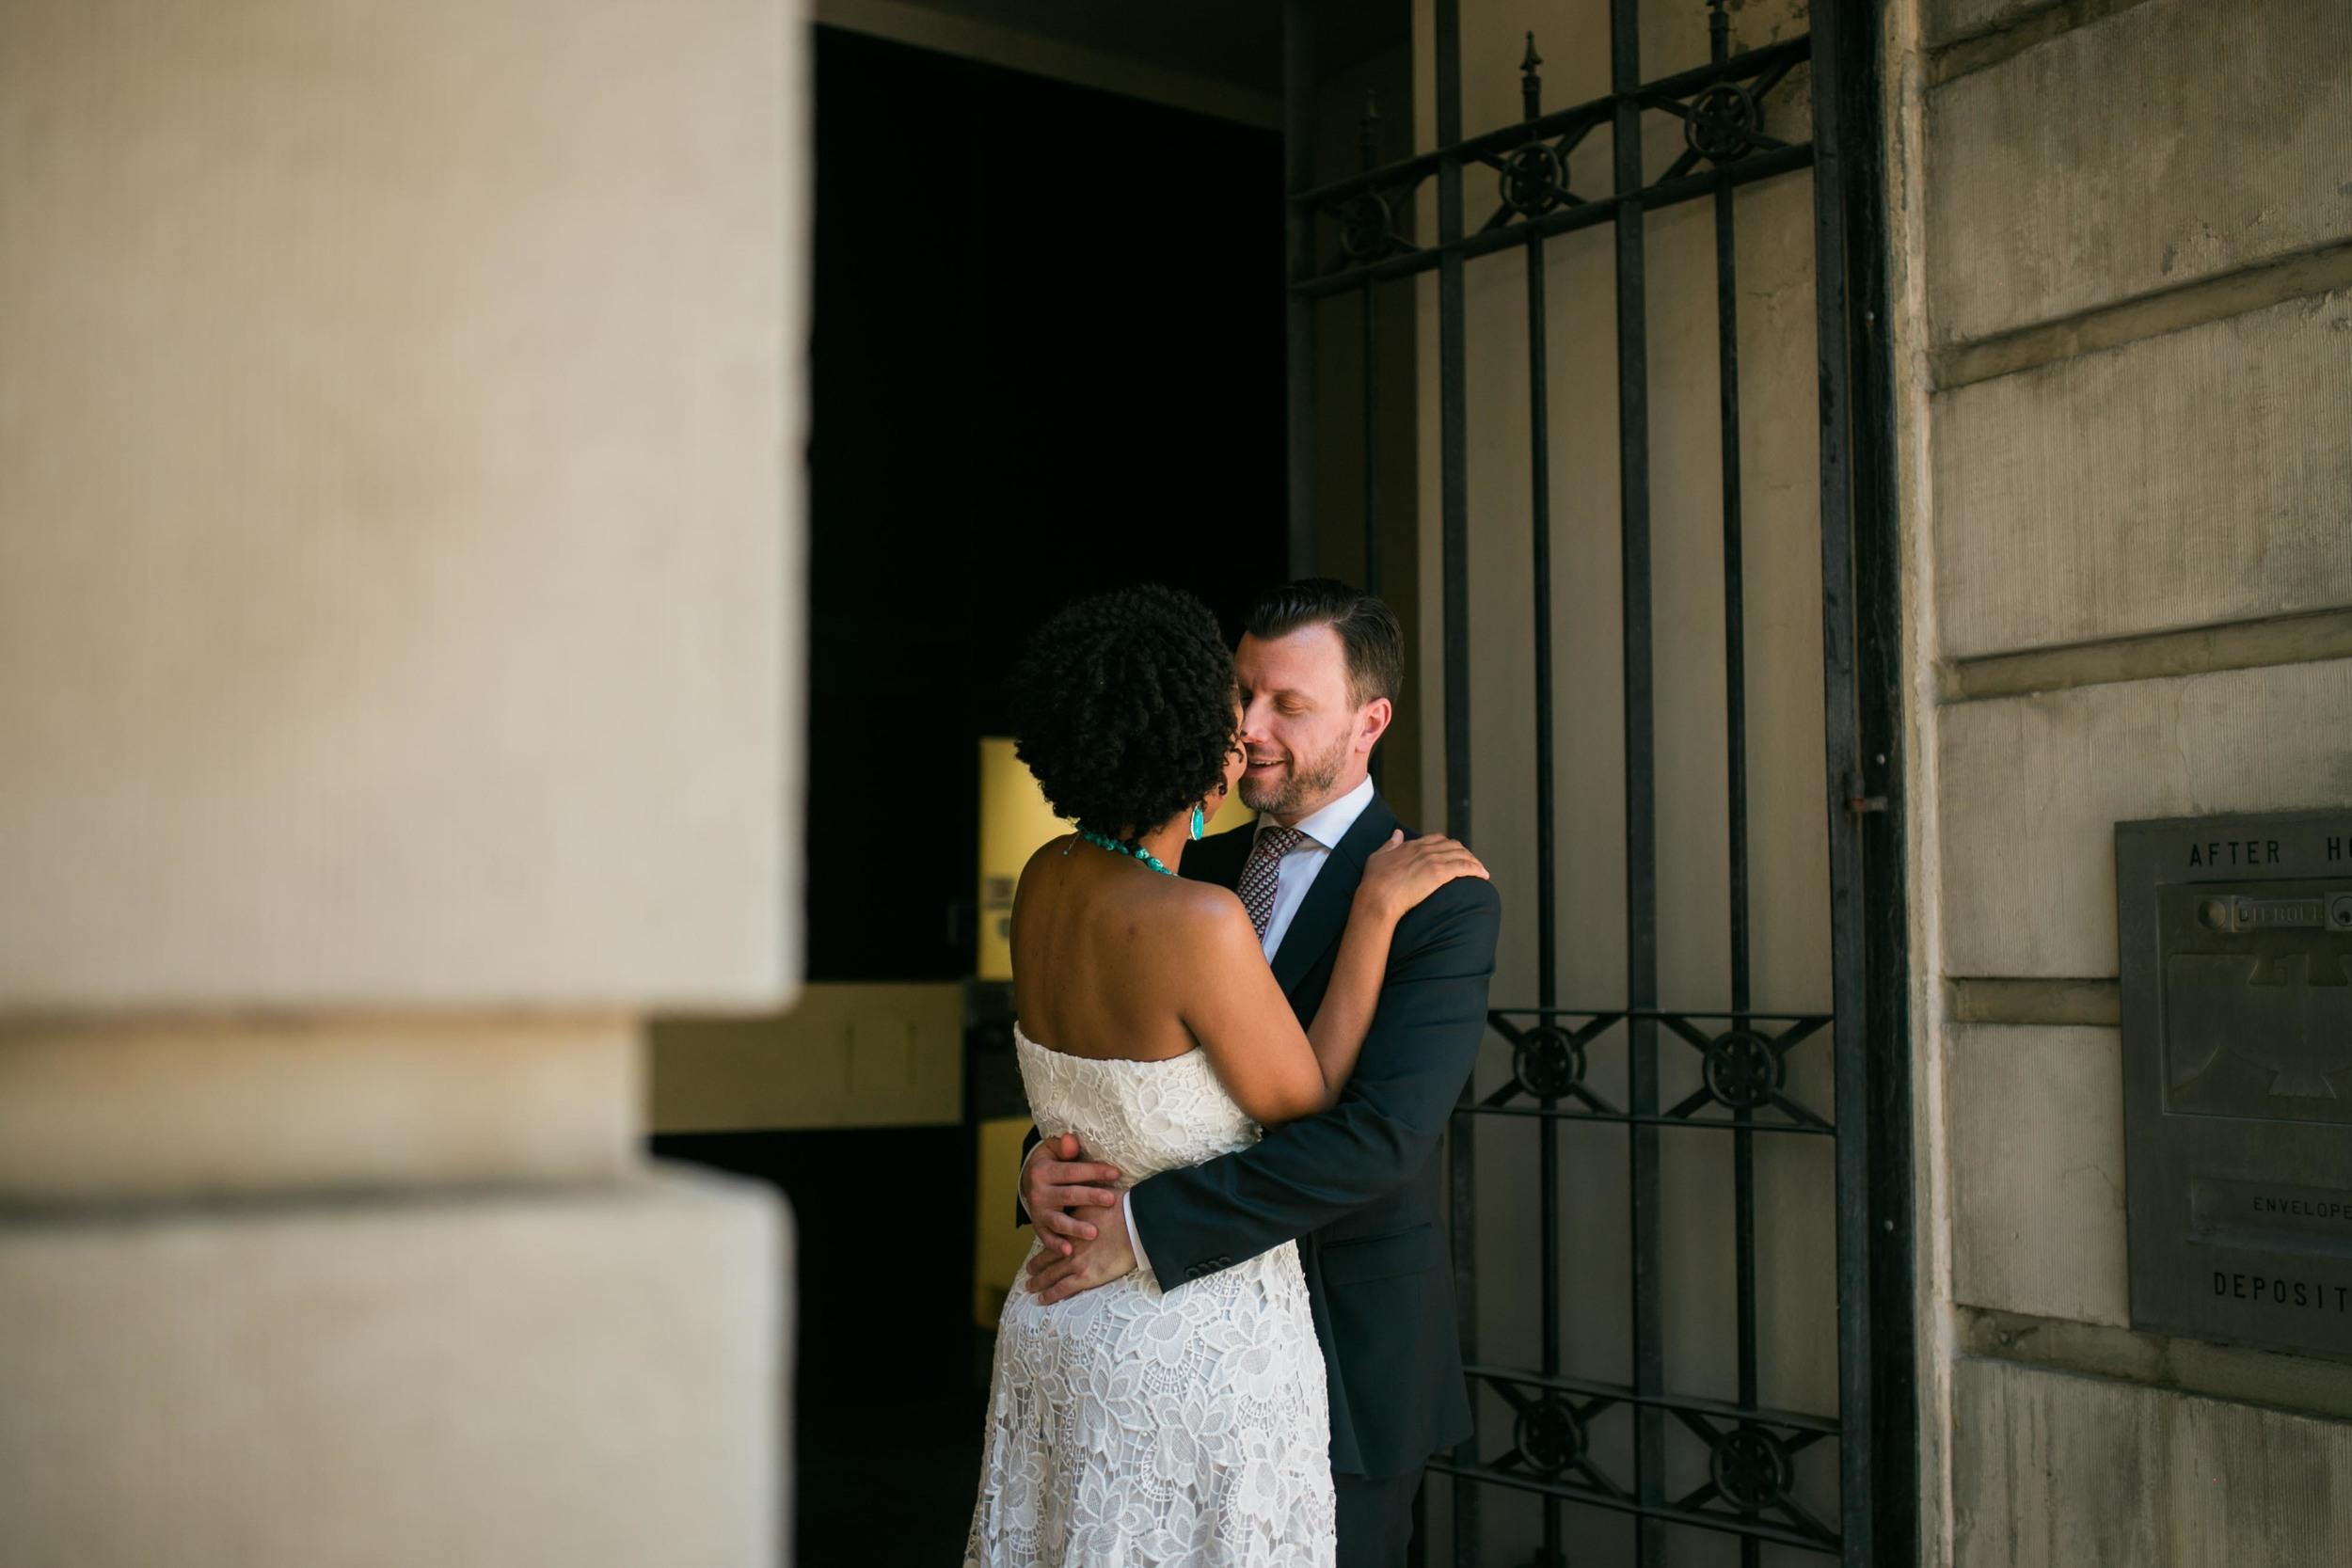 Dekalb-County-Courthouse-Wedding-Photos-Kiyah-C-Photography-60.jpg